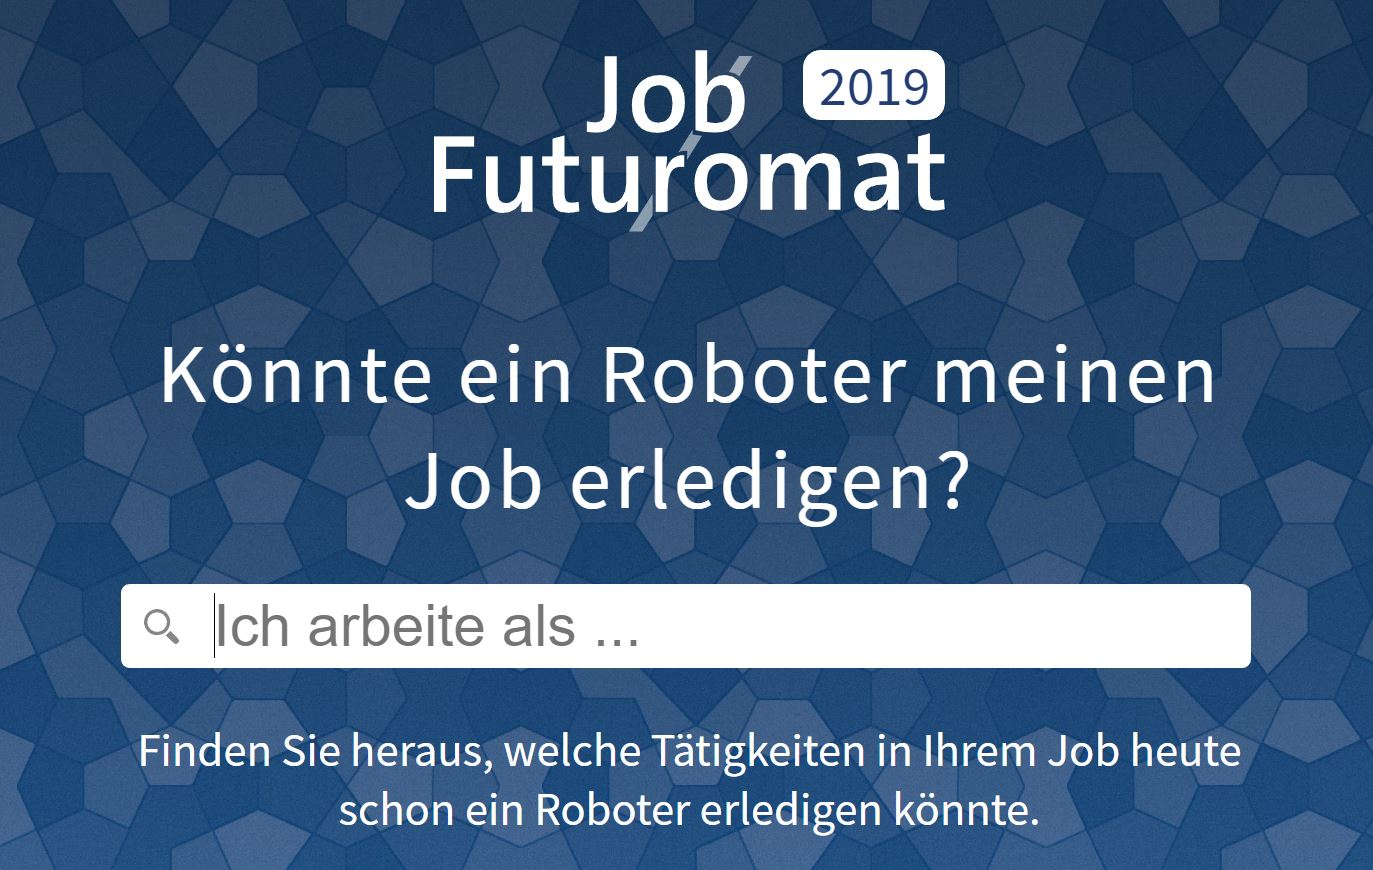 Job Futuromat